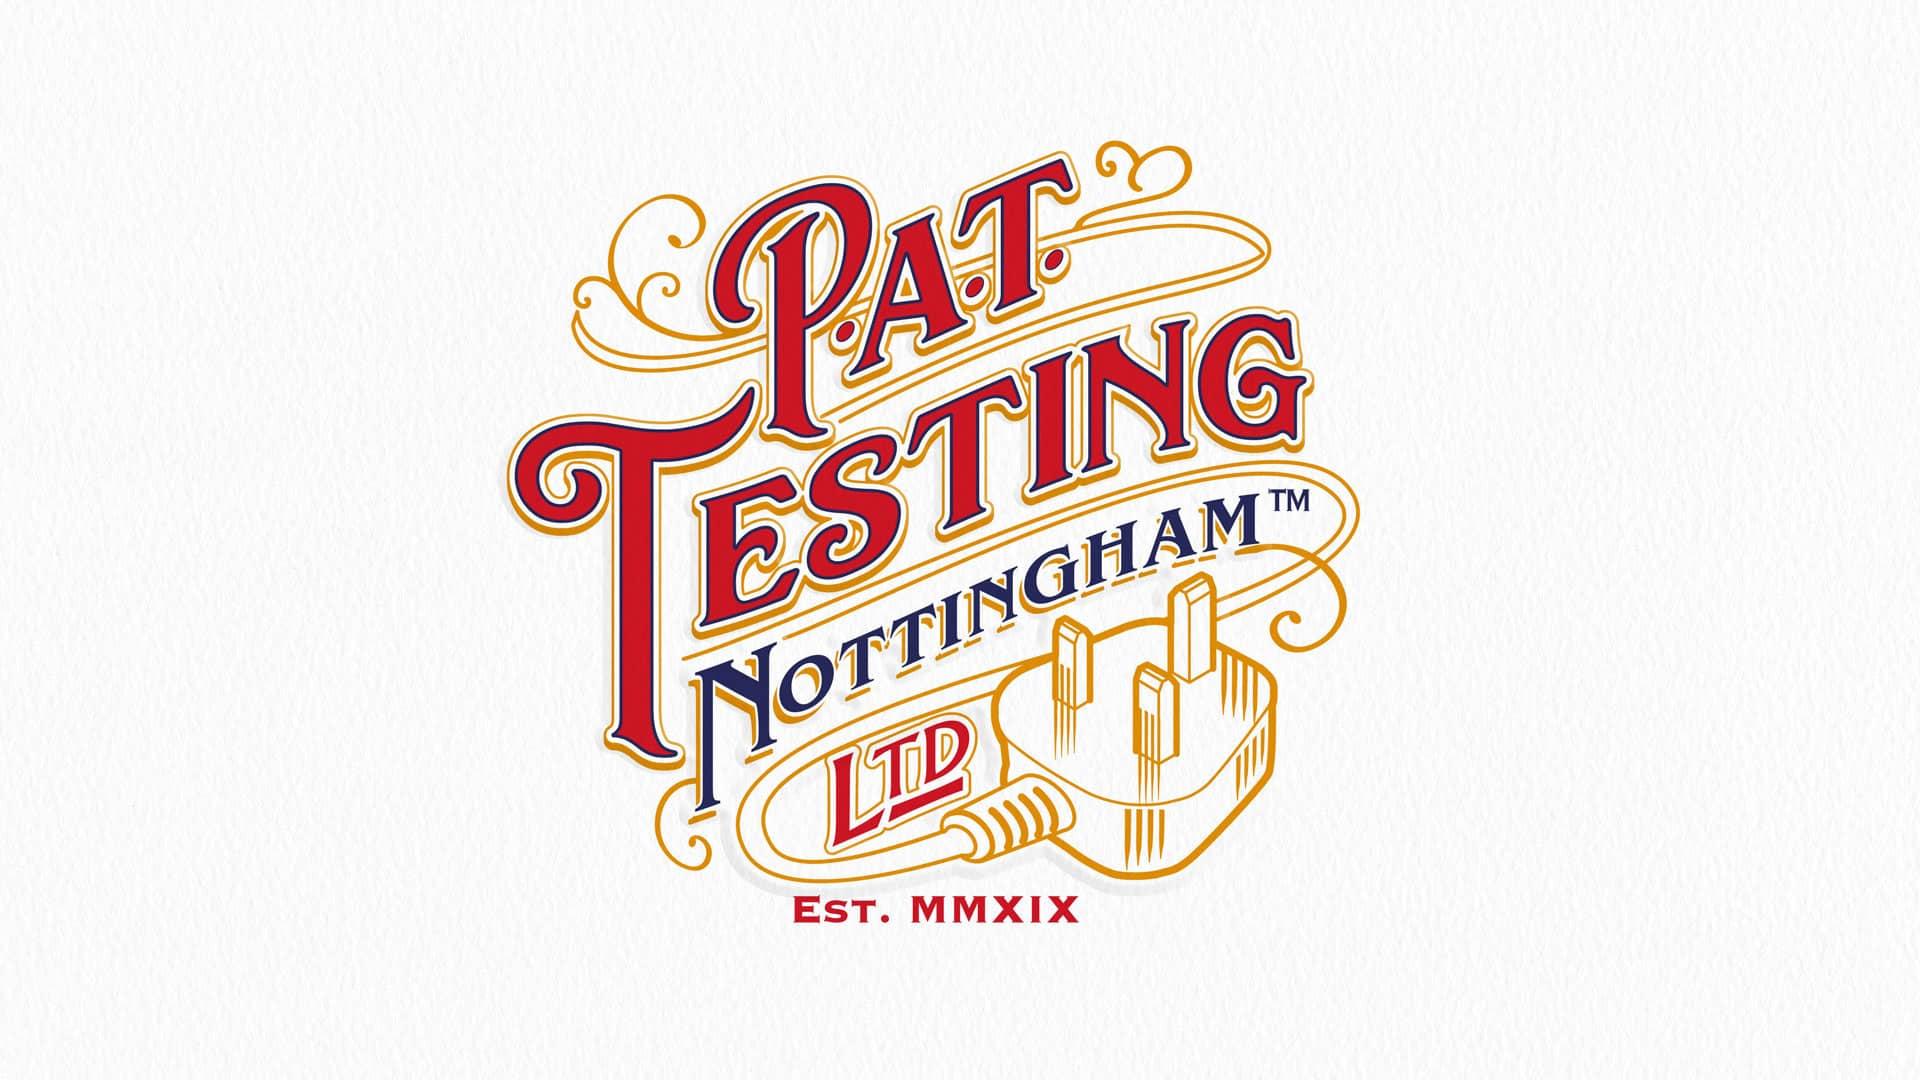 Pat Test Case Study 1